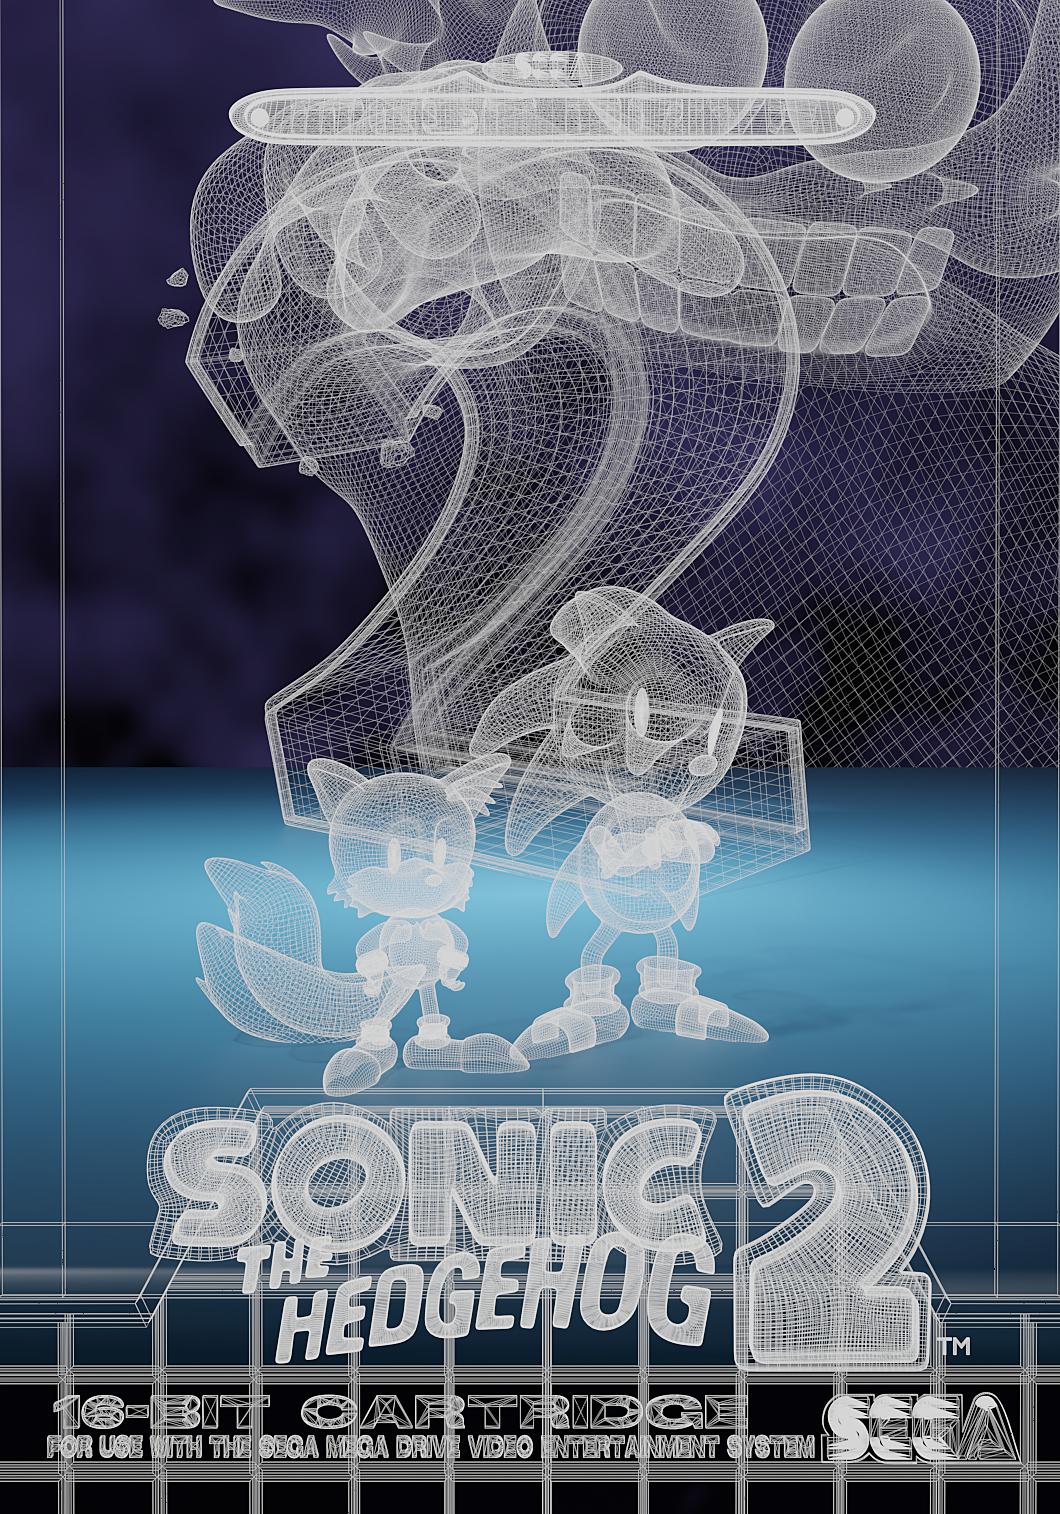 Sonic the Hedgehog 2 - Mega Drive Box Art